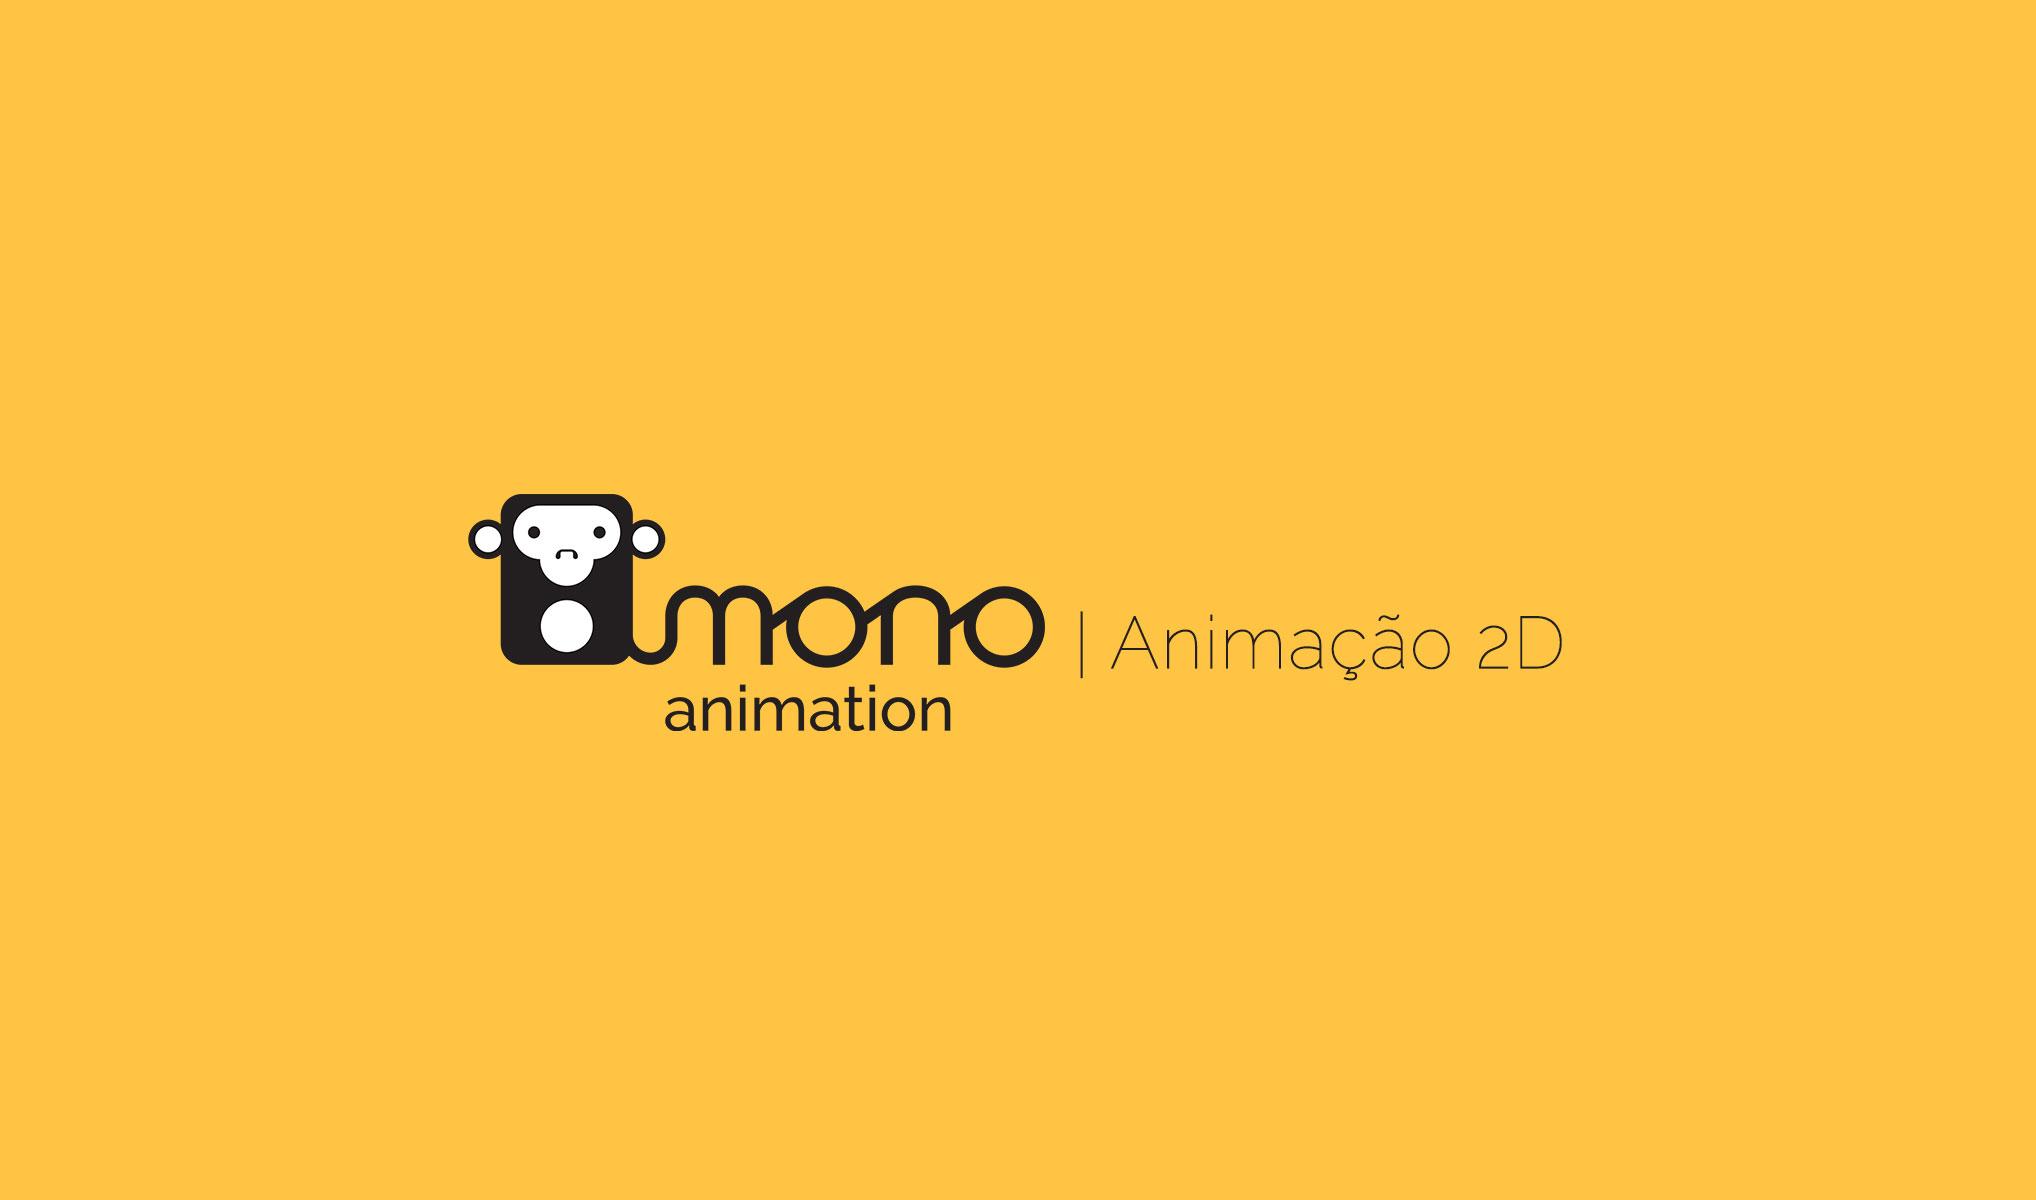 Reel | Animação 2D 1  - Mono Animation